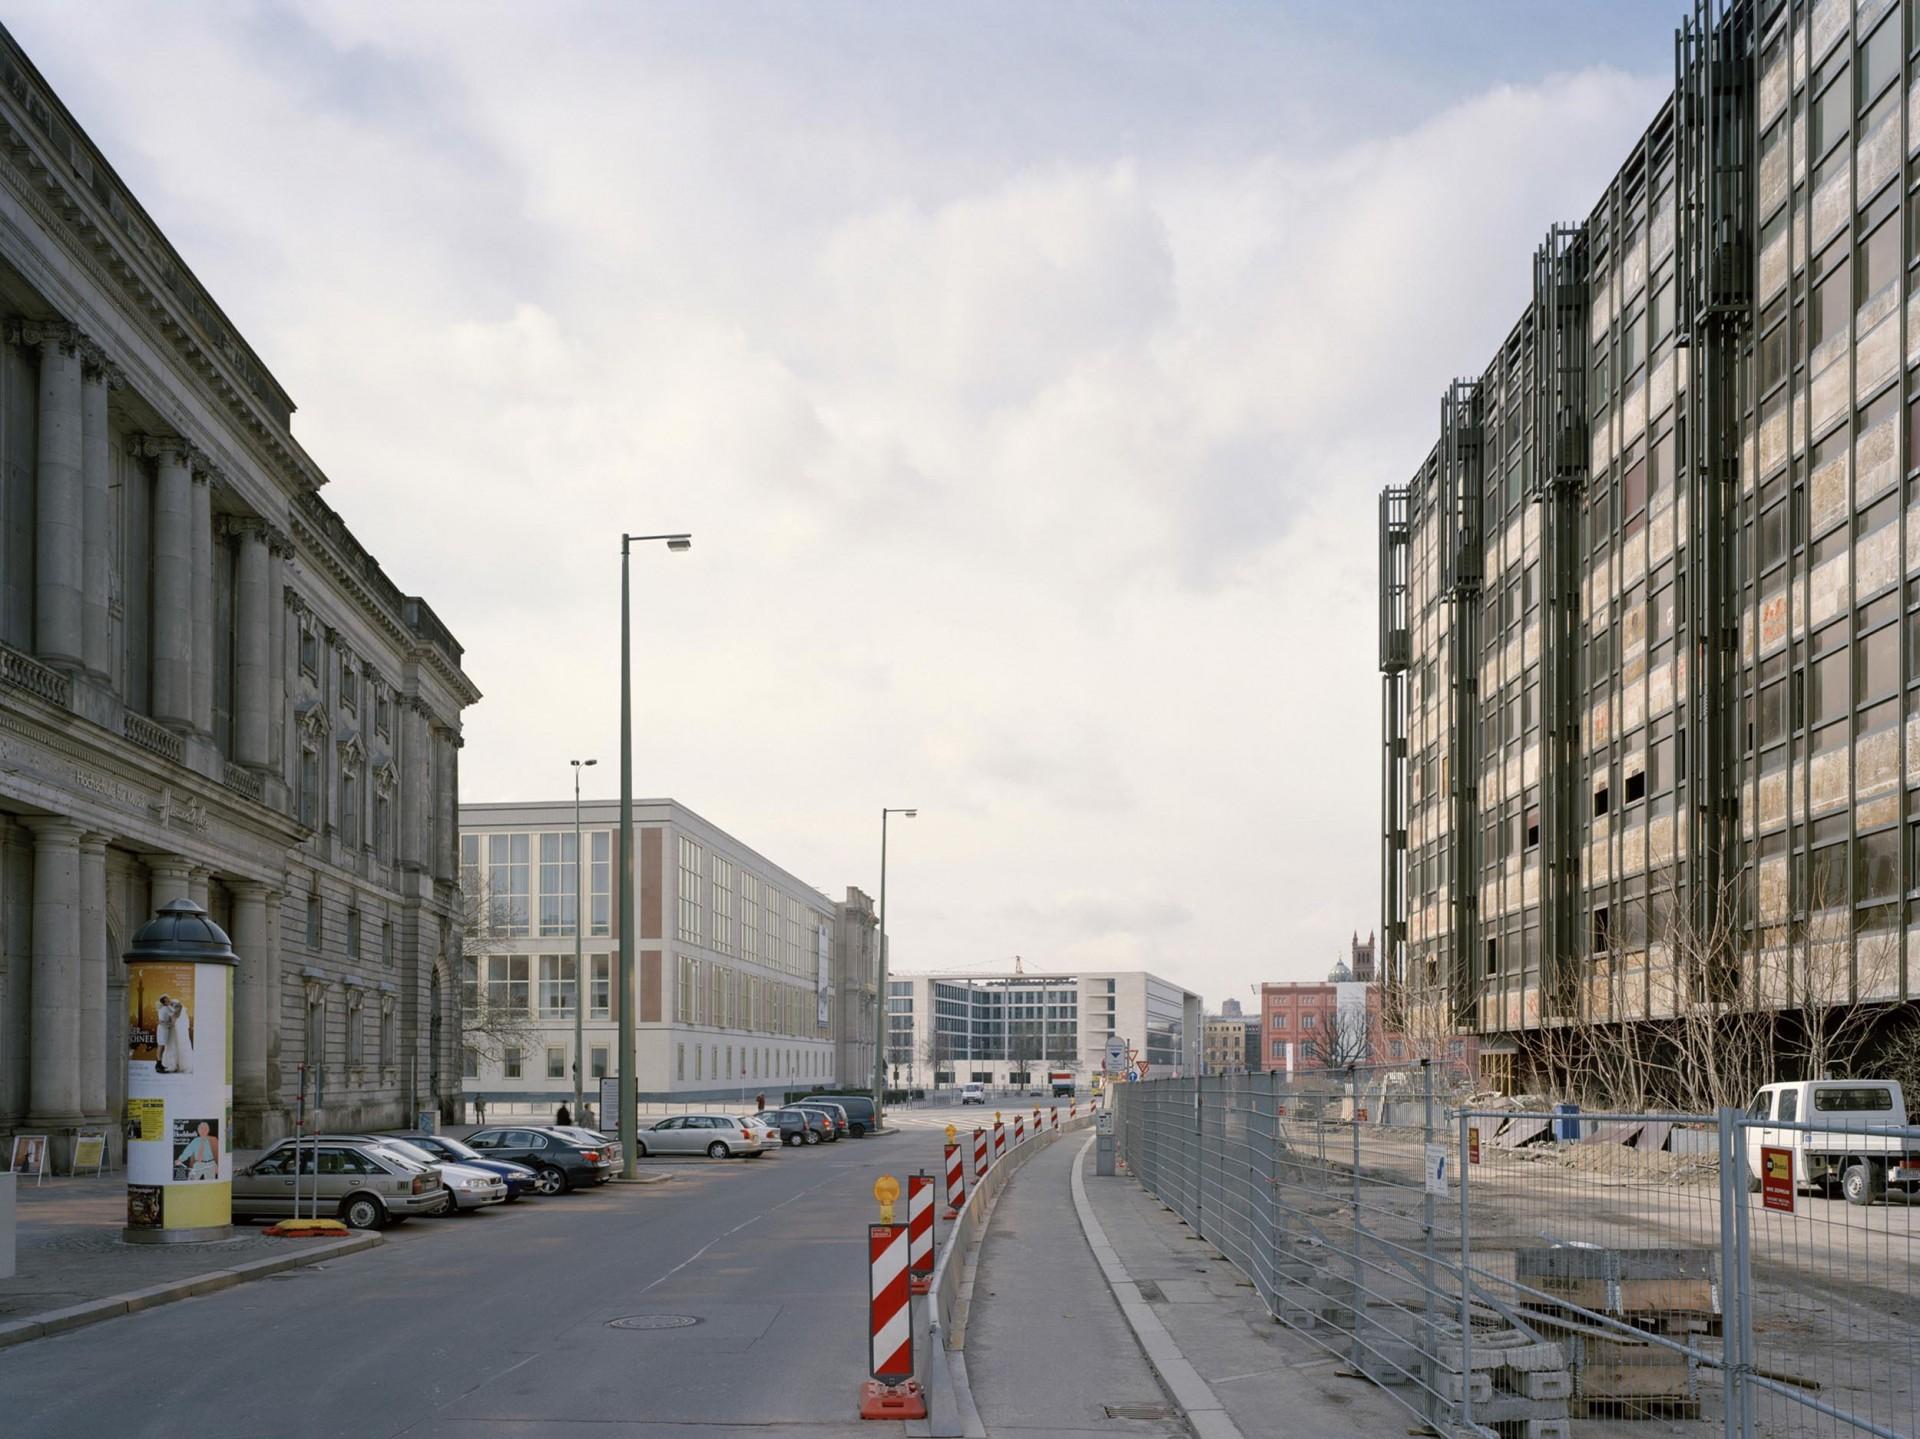 Thomas Bruns Fotografie Verlusterfahrung Moderne